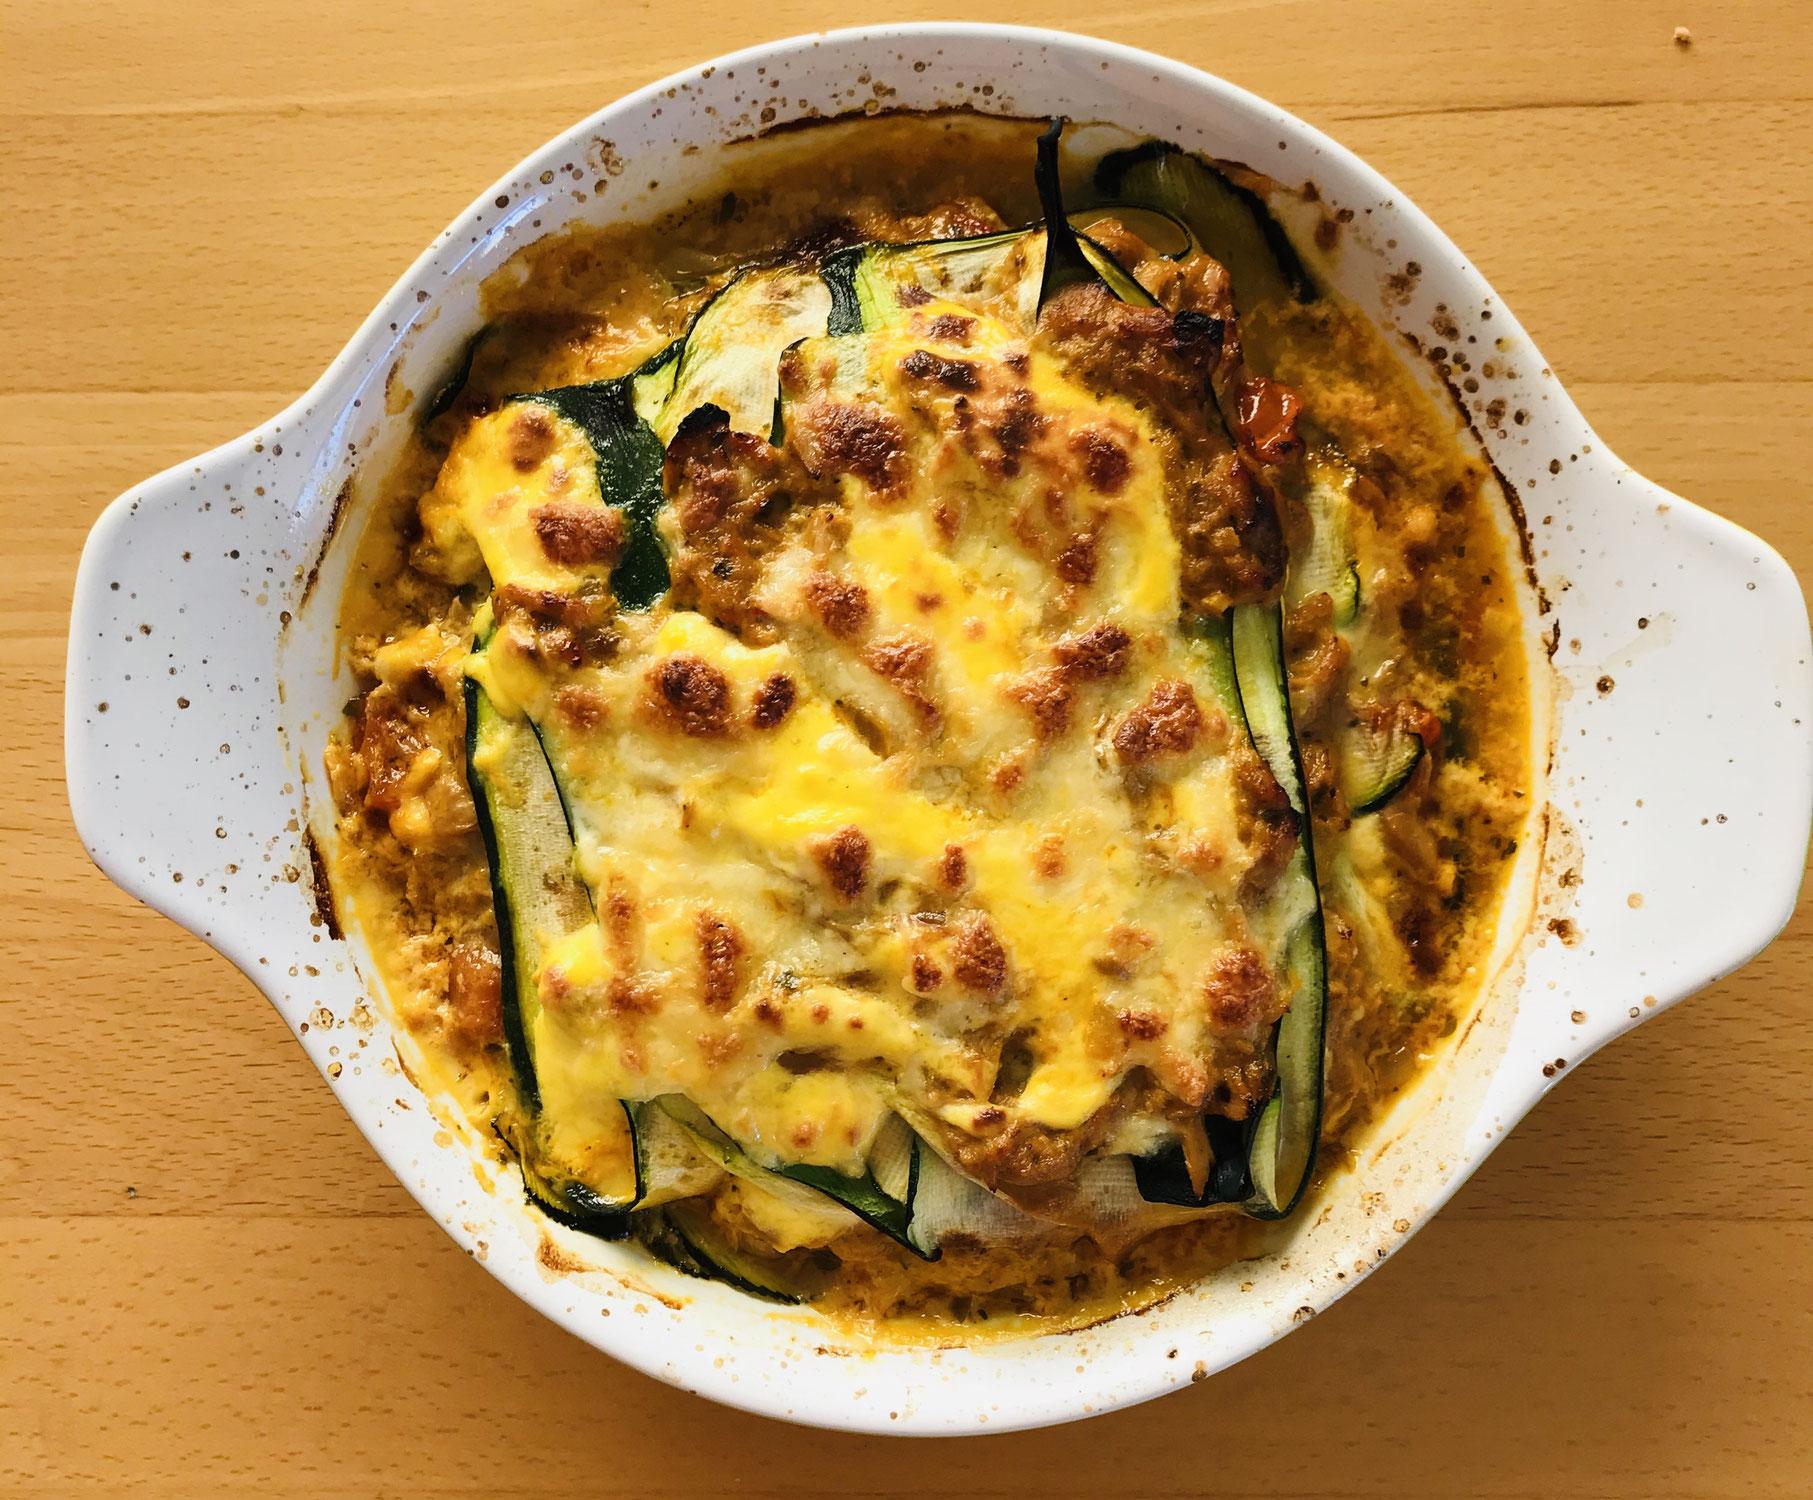 Thunfisch-Zucchini-Lasagne